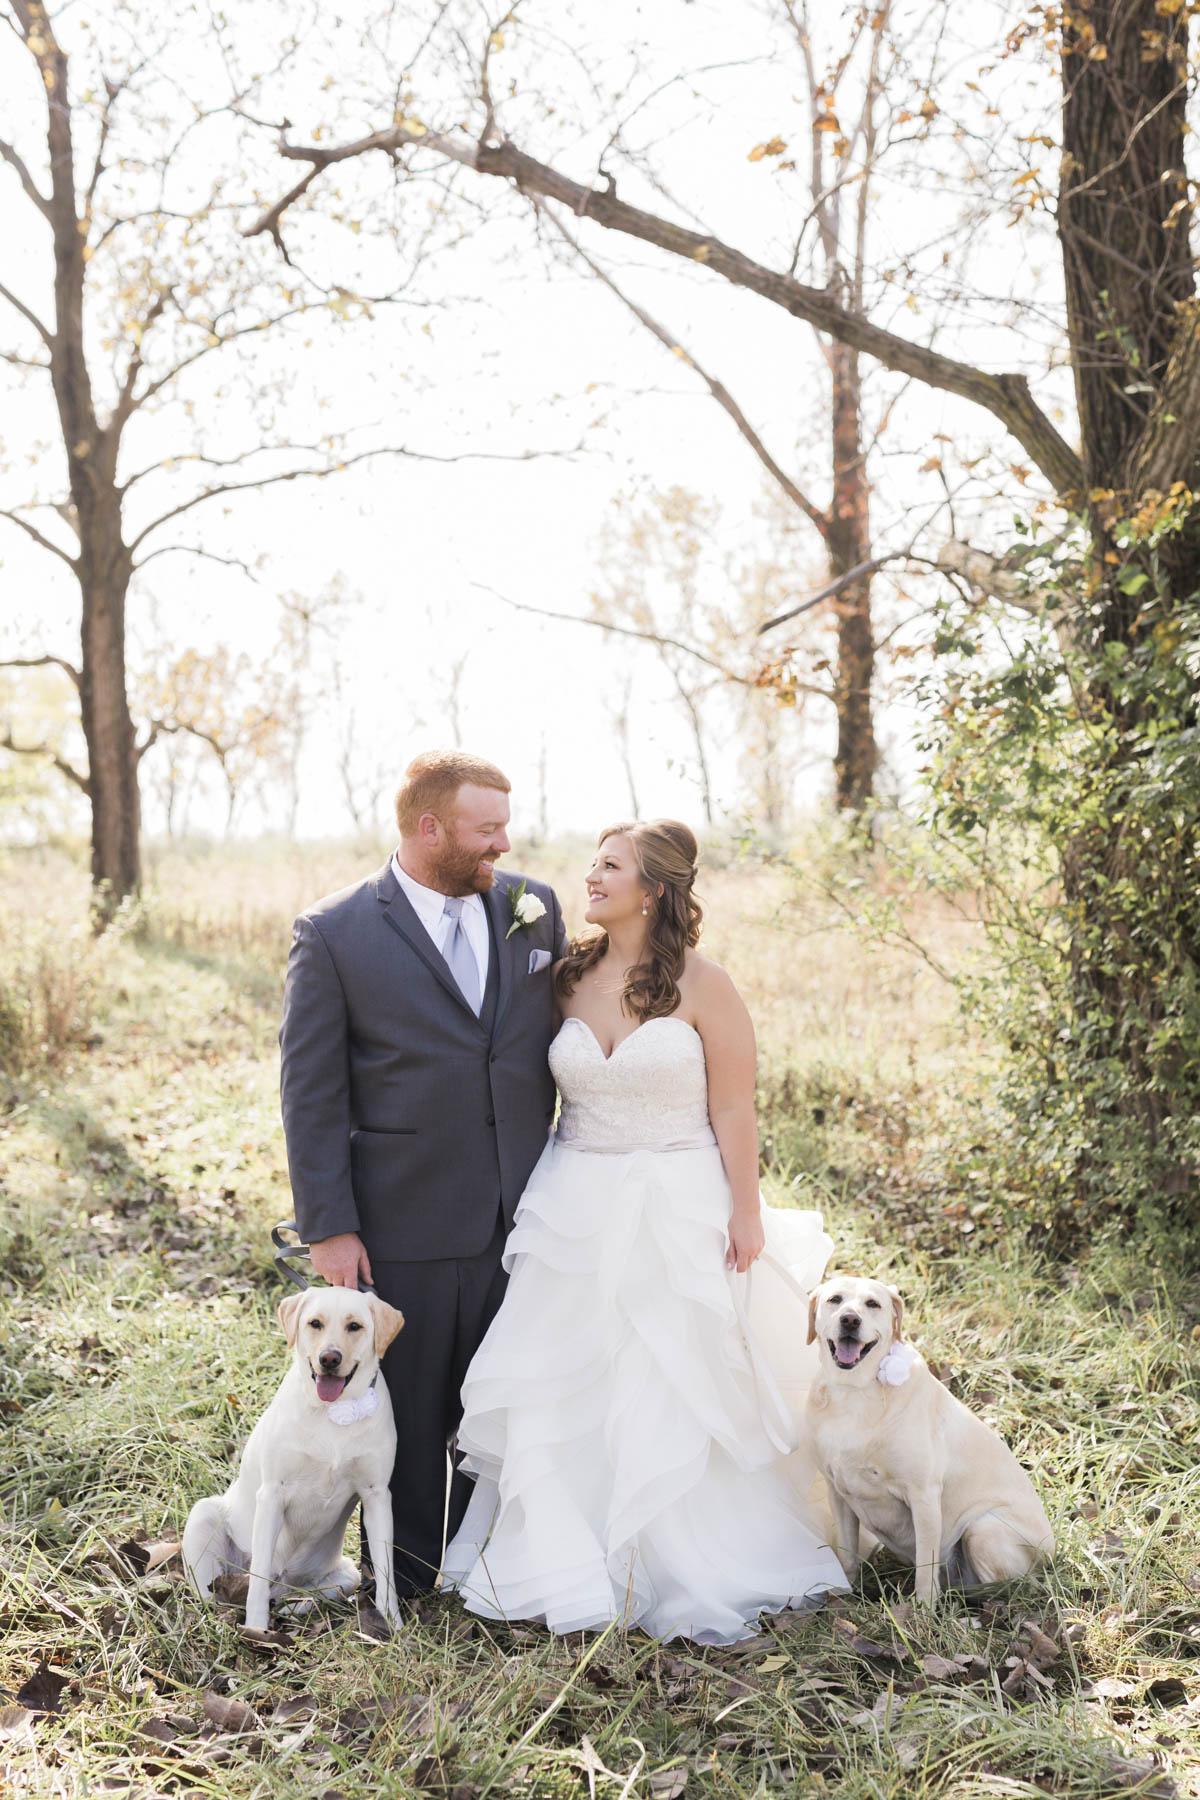 shotbychelsea_blog_wedding-13.jpg